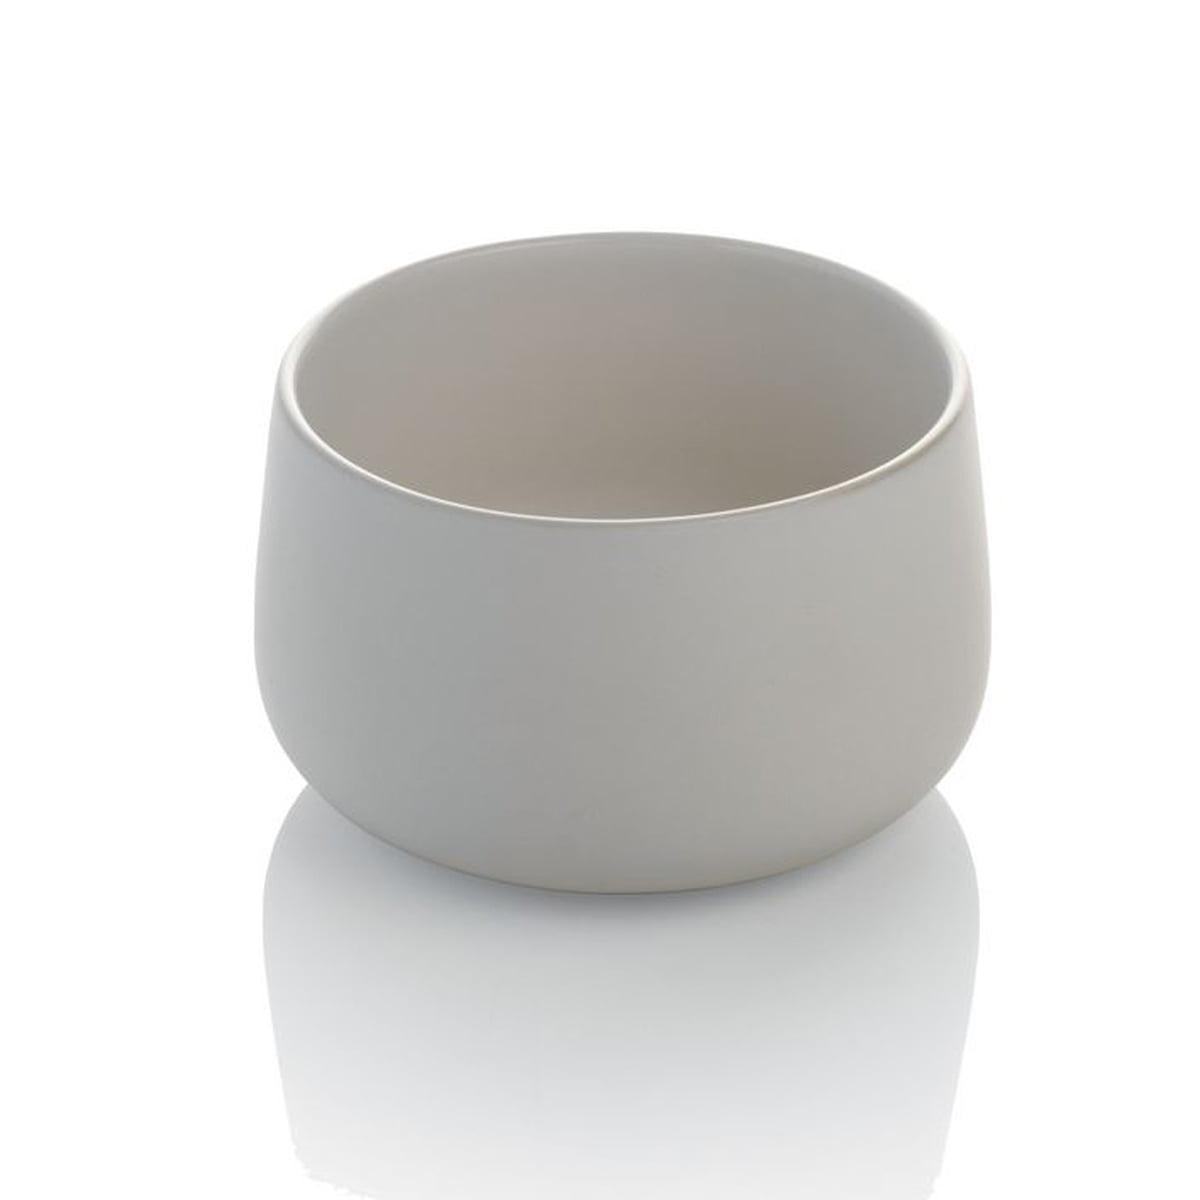 ovale dessert bowl  alessi  shop - alessi  dessert bowl